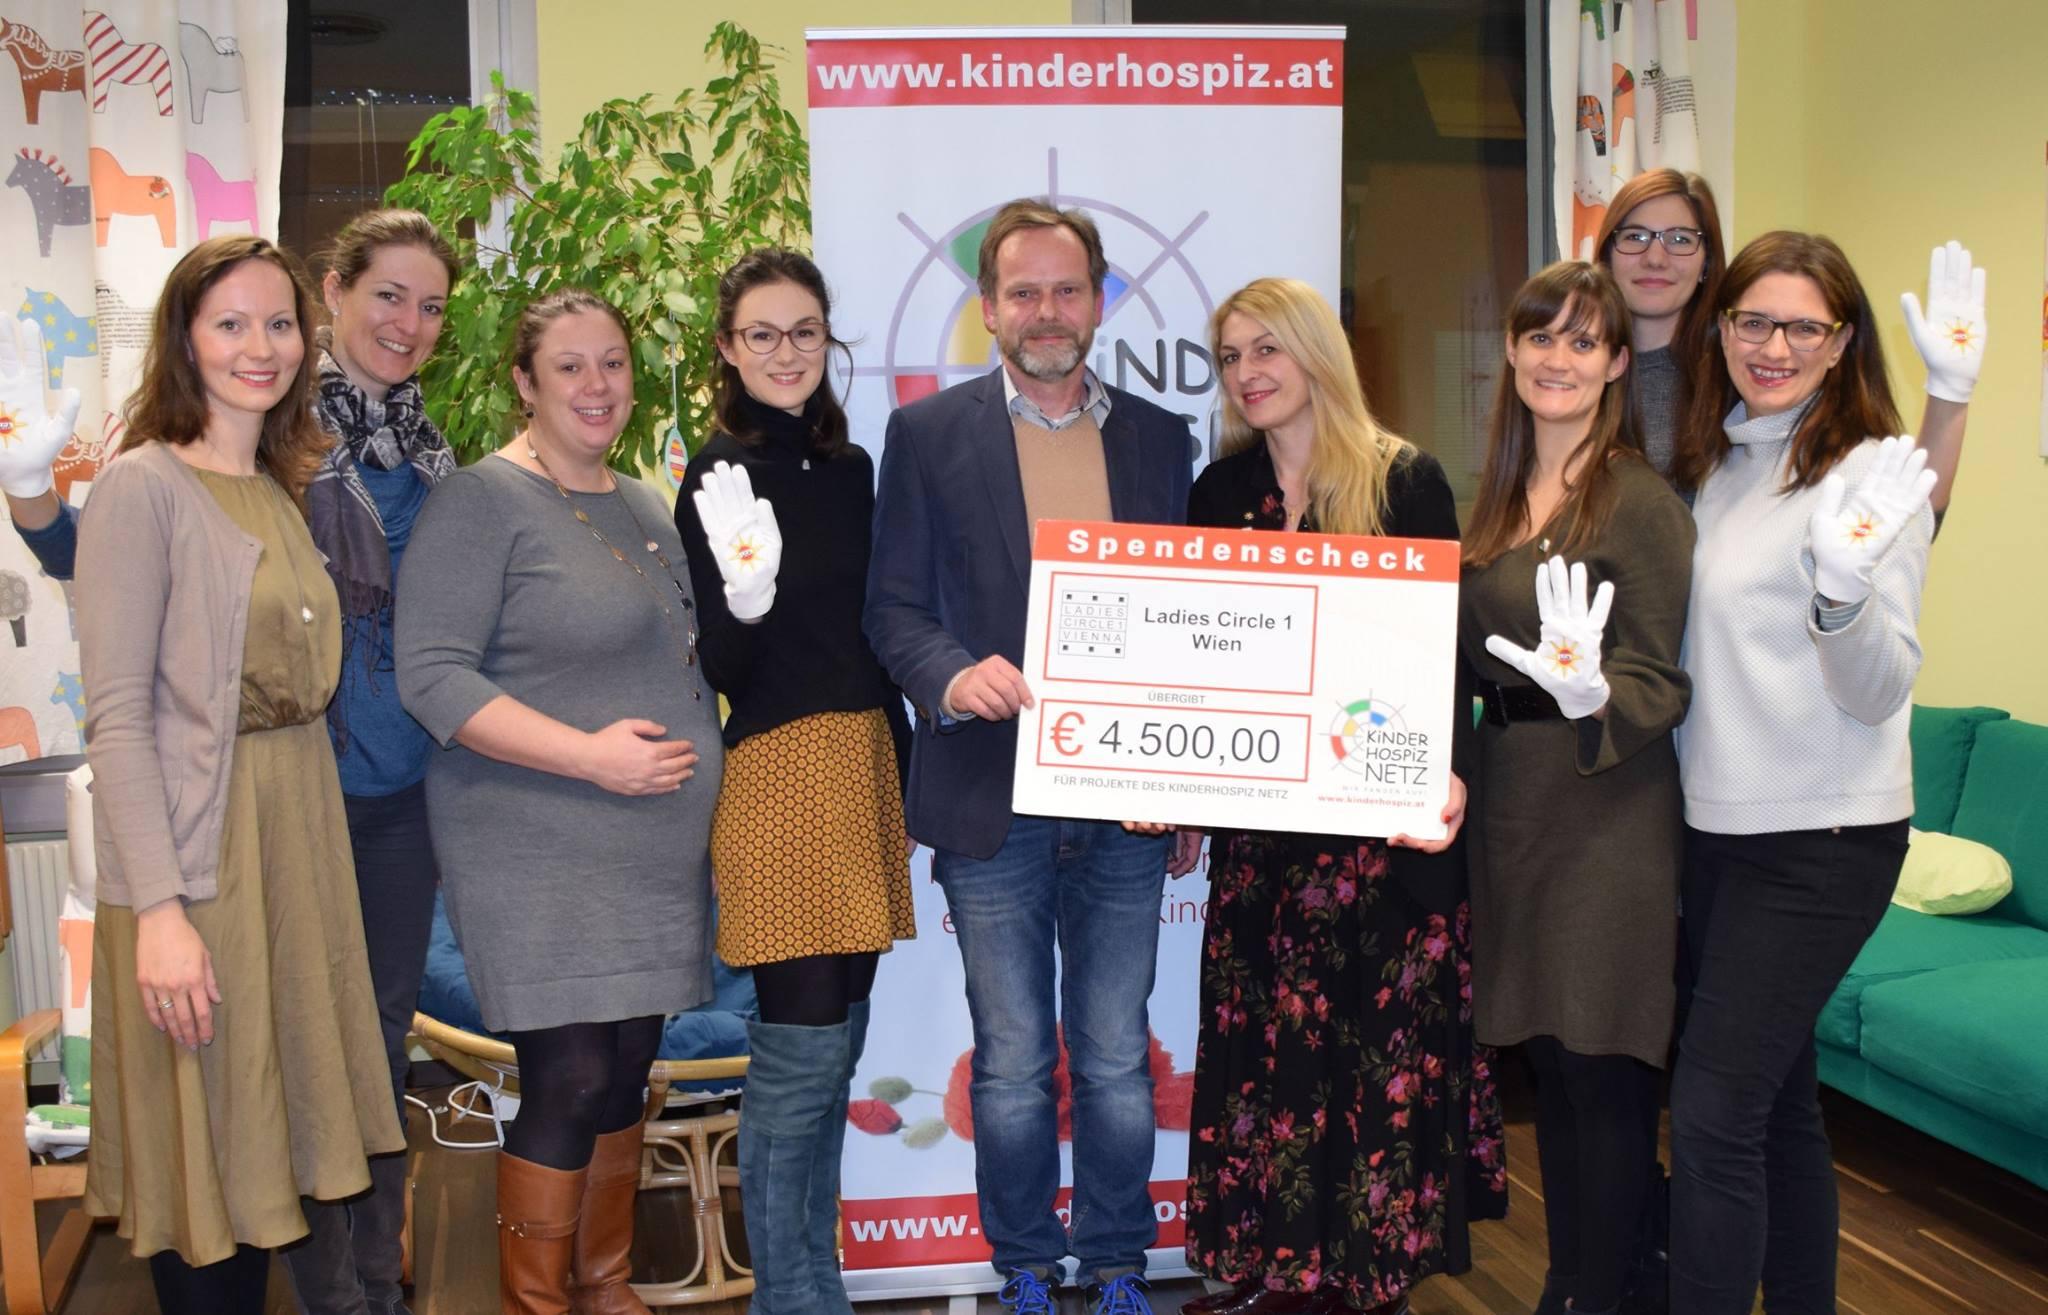 Spendenübergabe Kinderhospiz Netz 2018